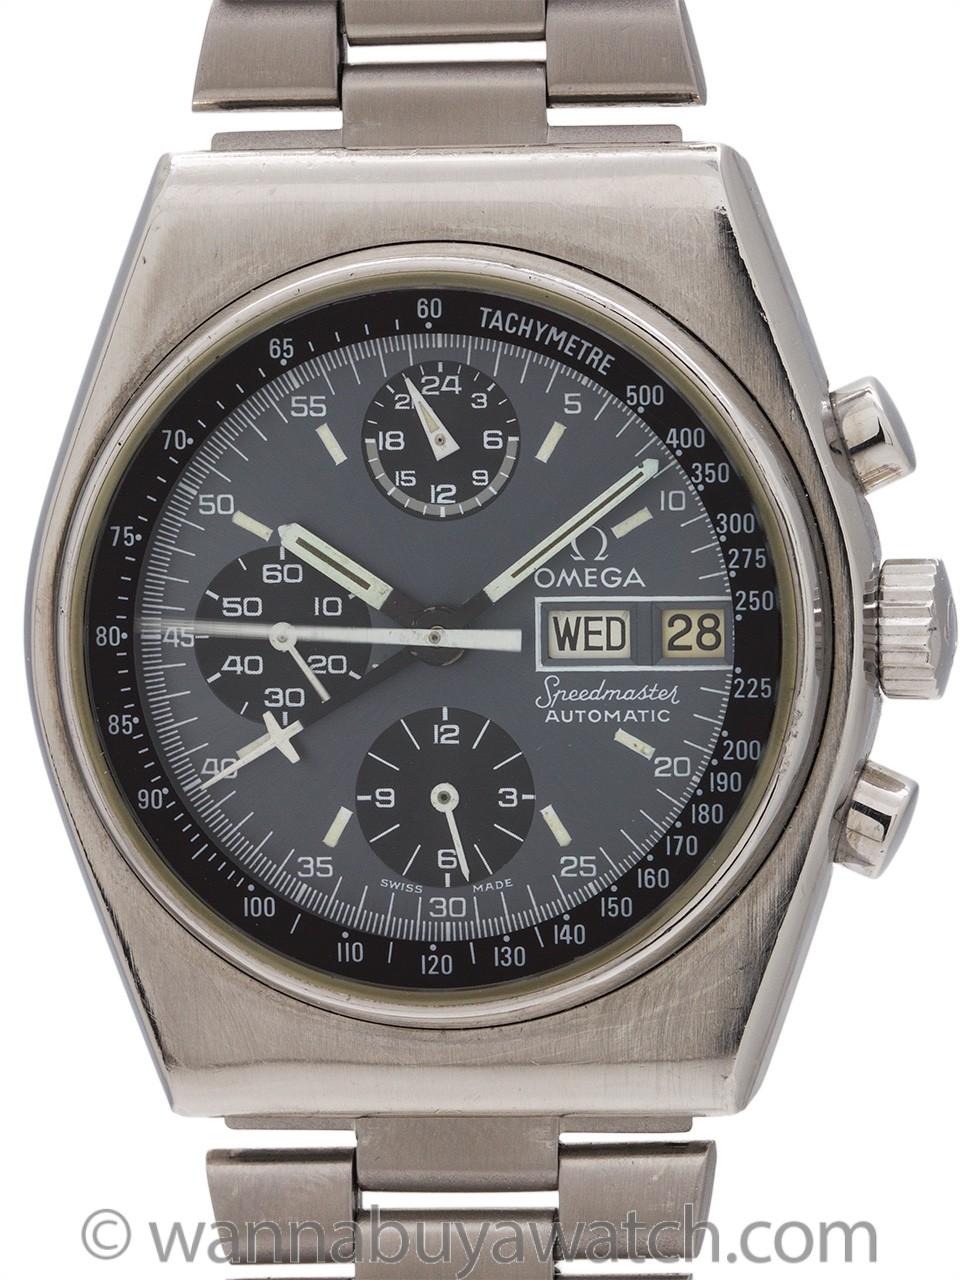 Omega Speedmaster Automatic Mark IV 1/2 176.0016 circa 1970's